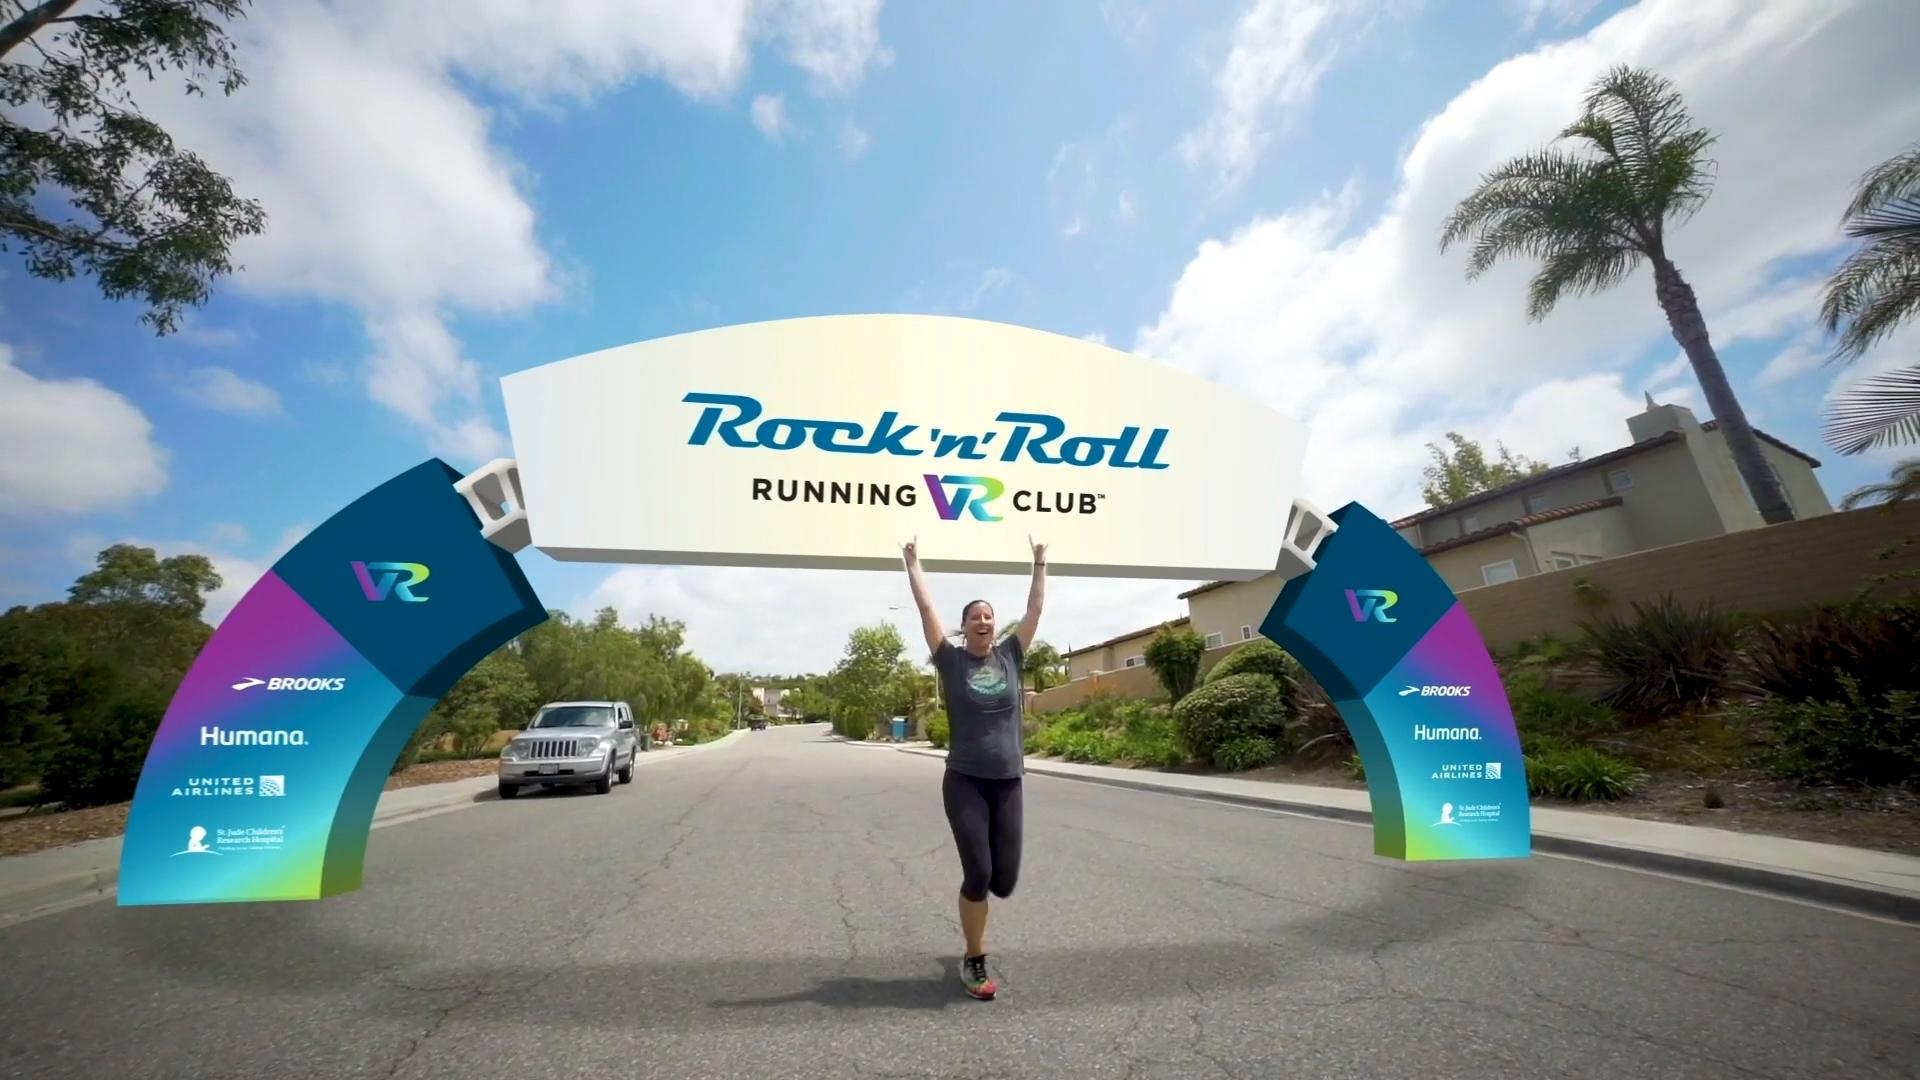 Rock 'n' Roll Marathon Series Introduces New Virtual Run